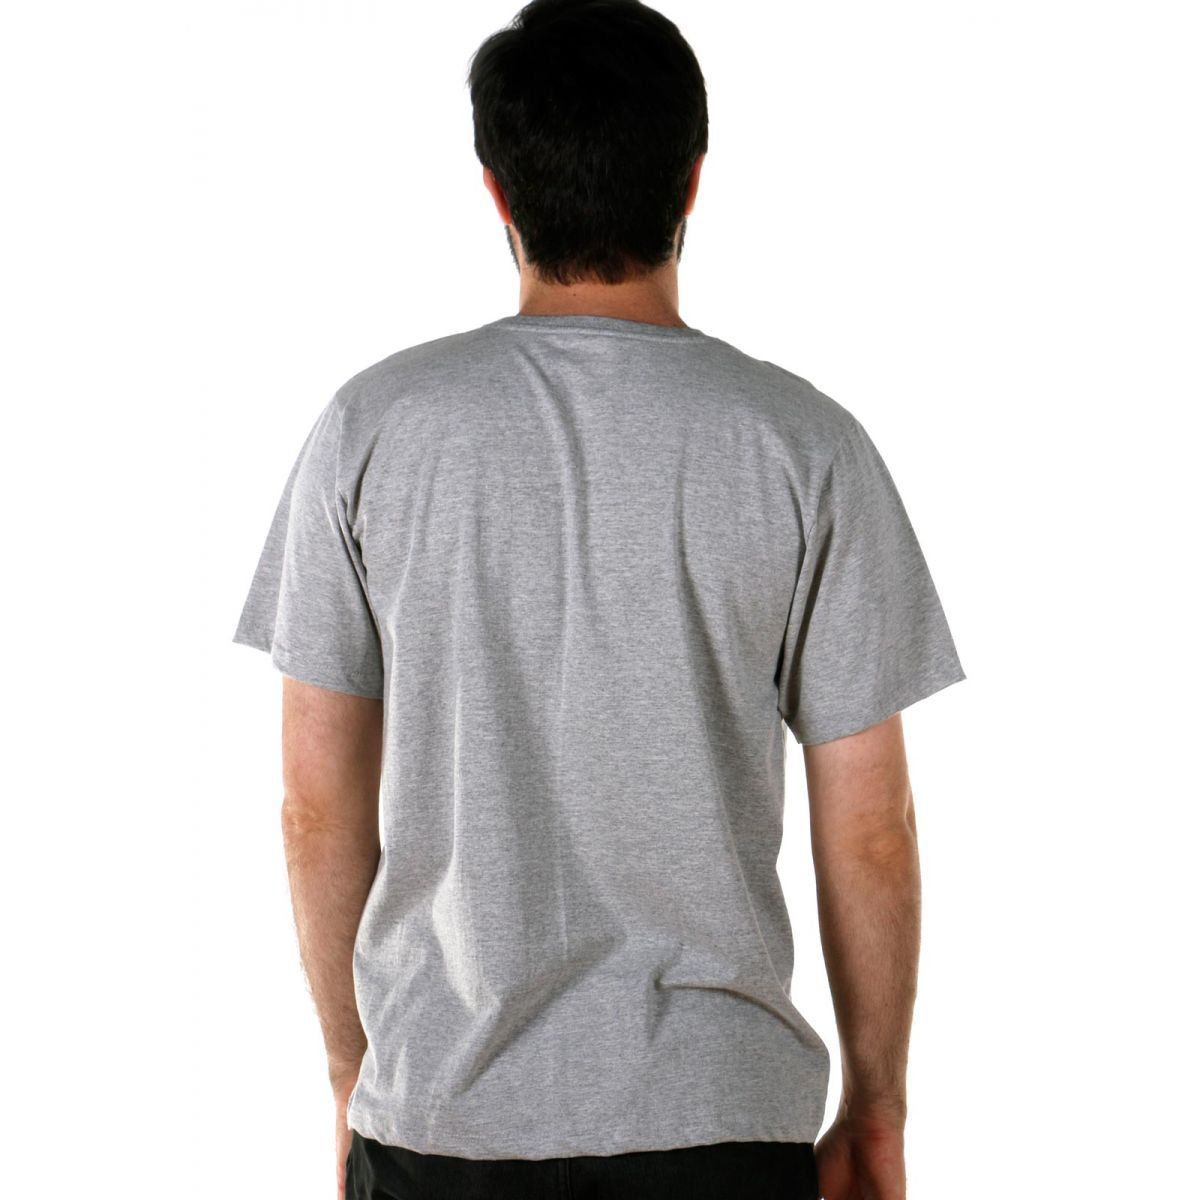 Camiseta Masculina Chaves Pague o Aluguel  - bandUP Store Marketplace